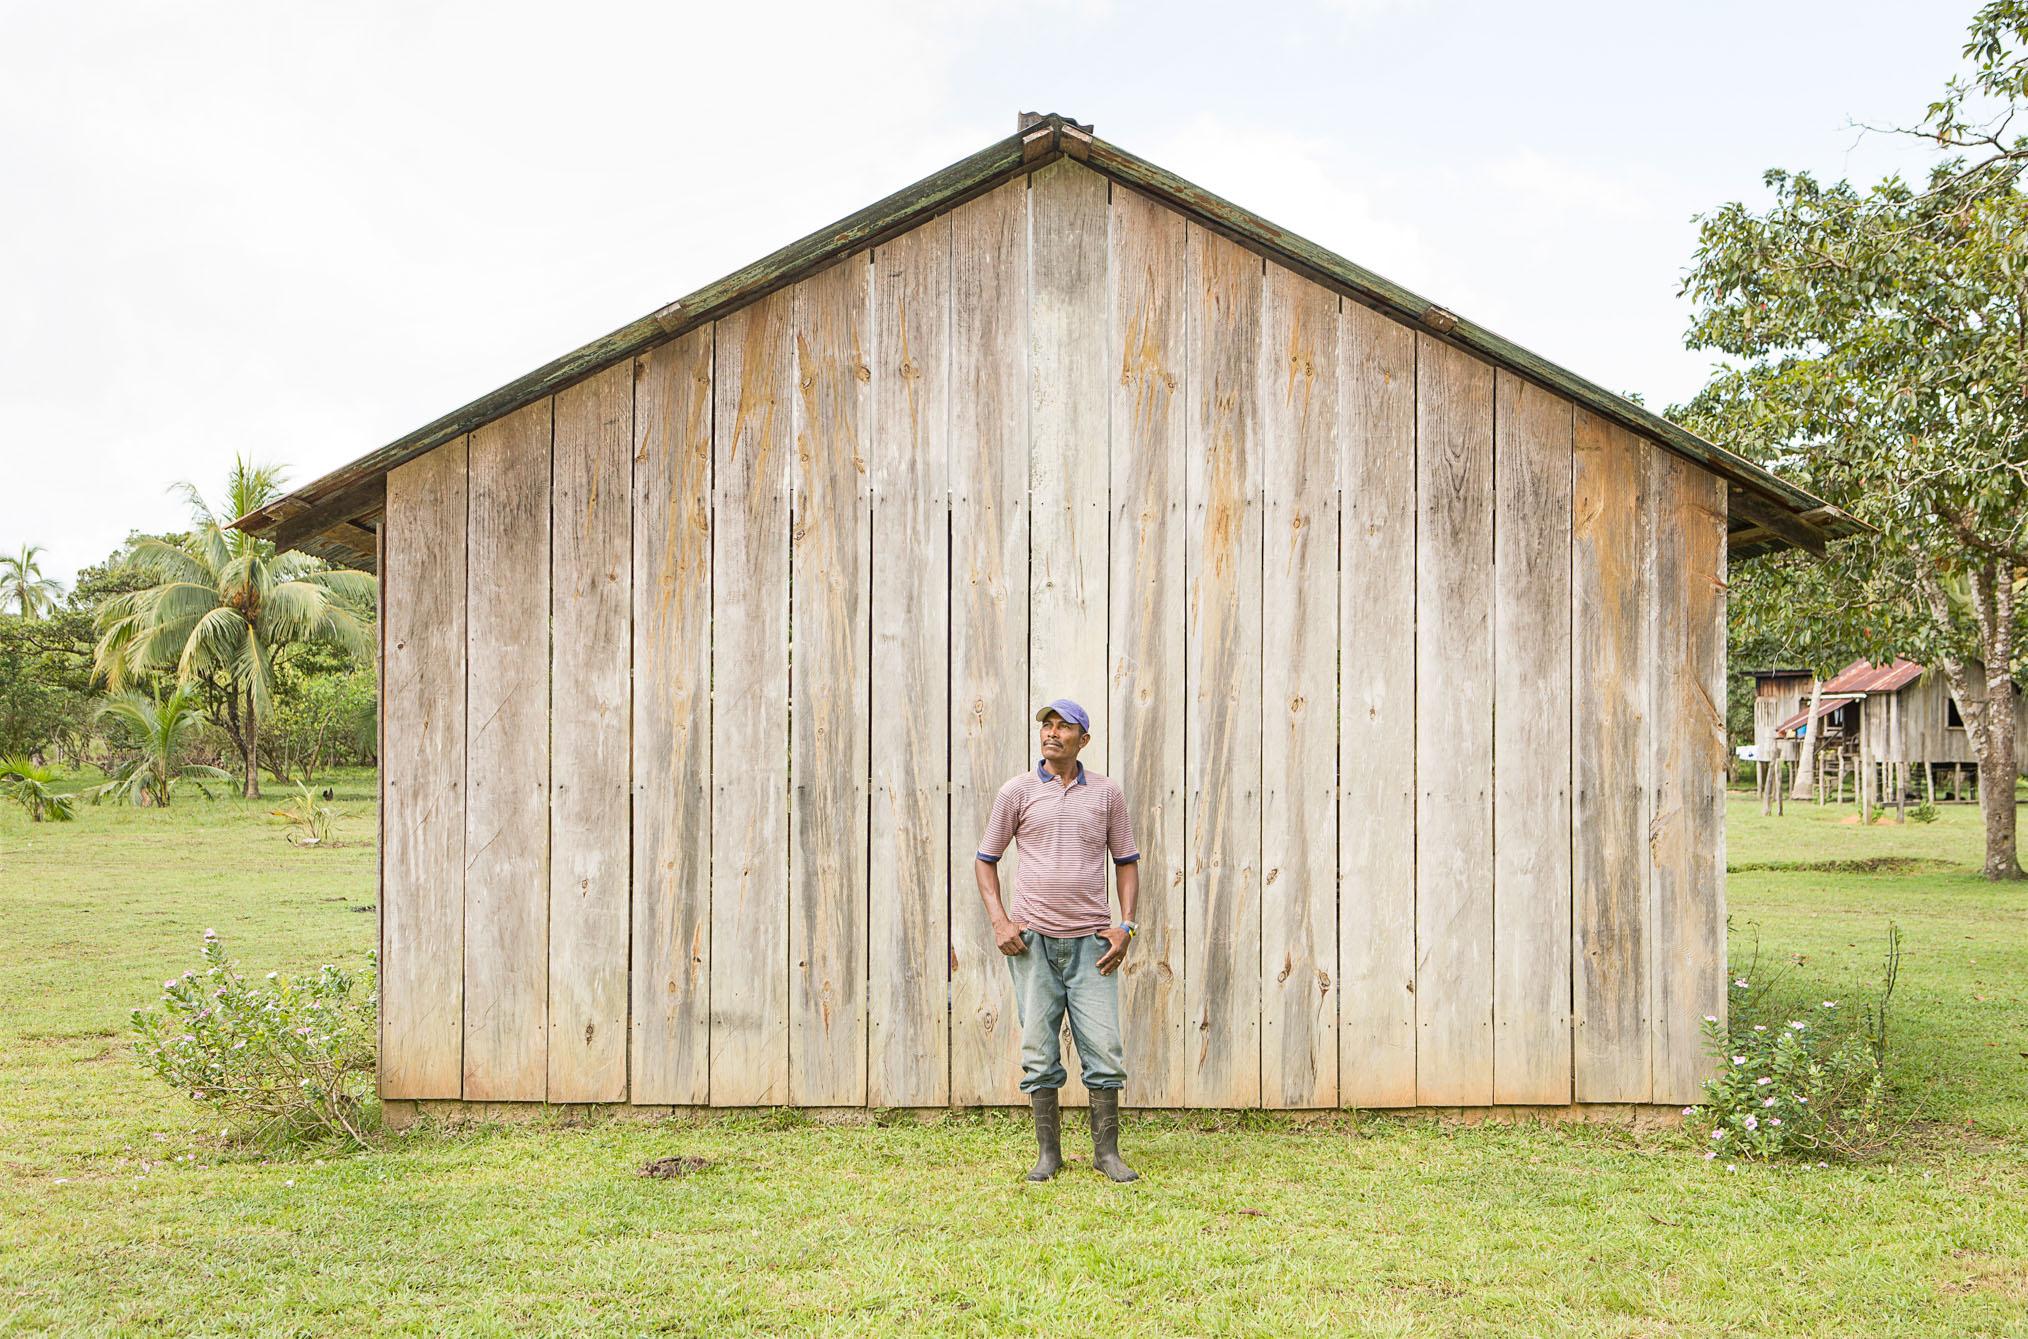 Pascasio Lacoth montoya, Mabita, La Mosquitia, Honduras - If Not Us Then Who?